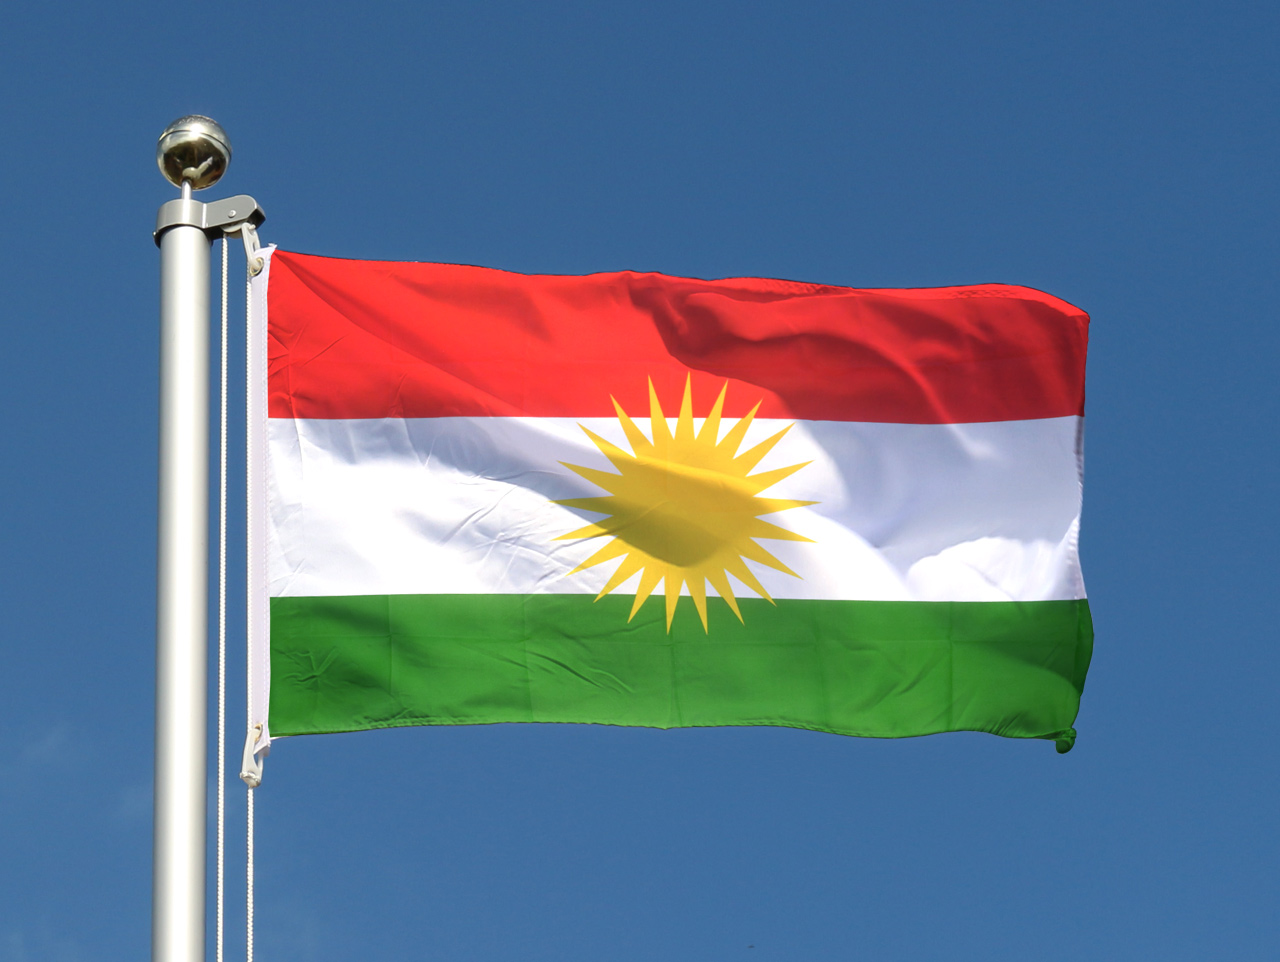 картинки с флагом курдистана что было так